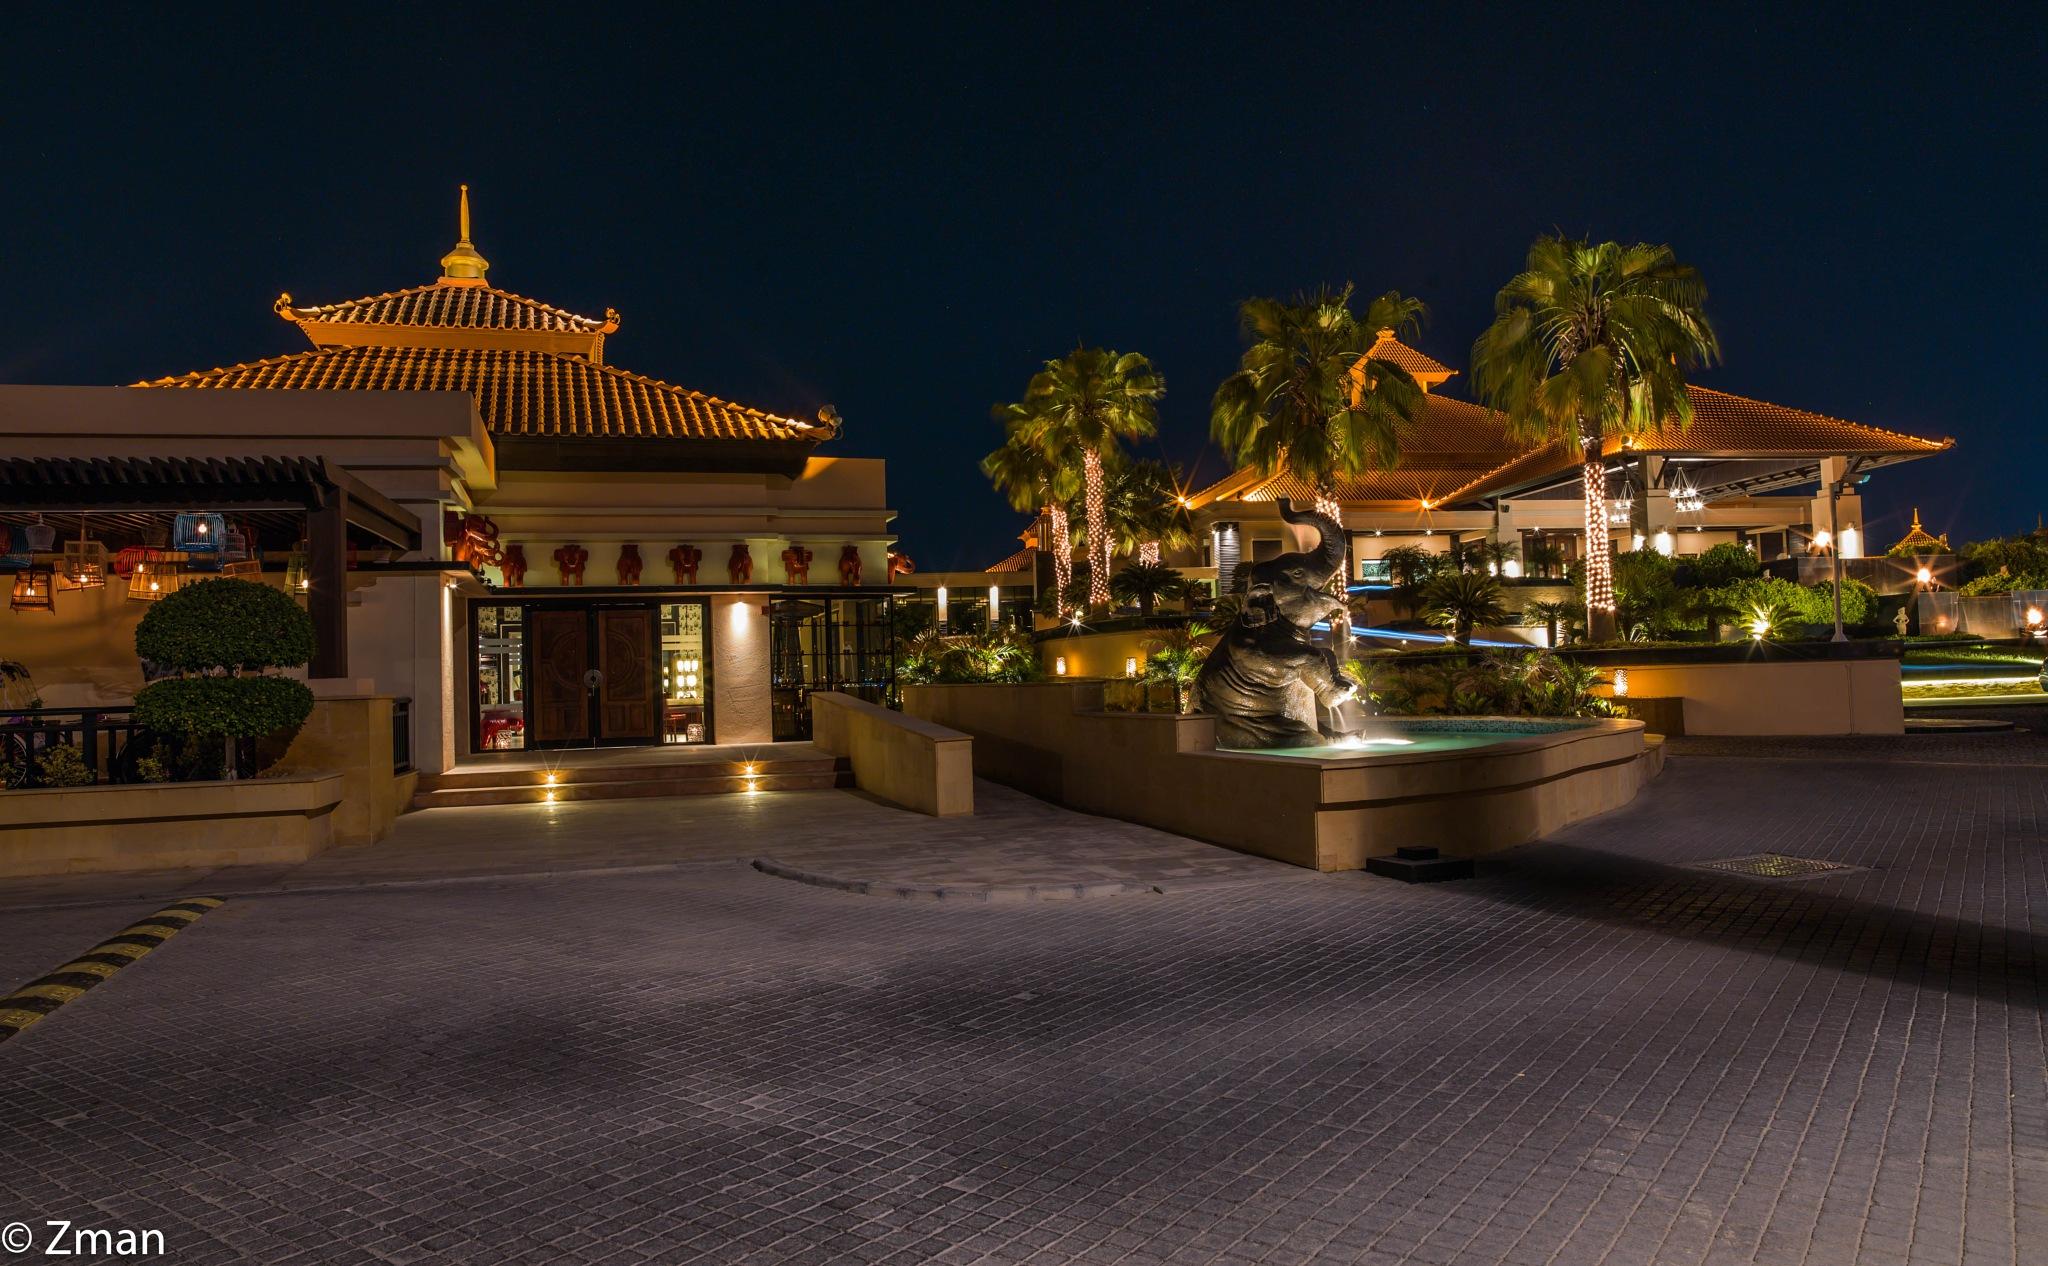 Anantara Hotel and Resort 01 by muhammad.nasser.963